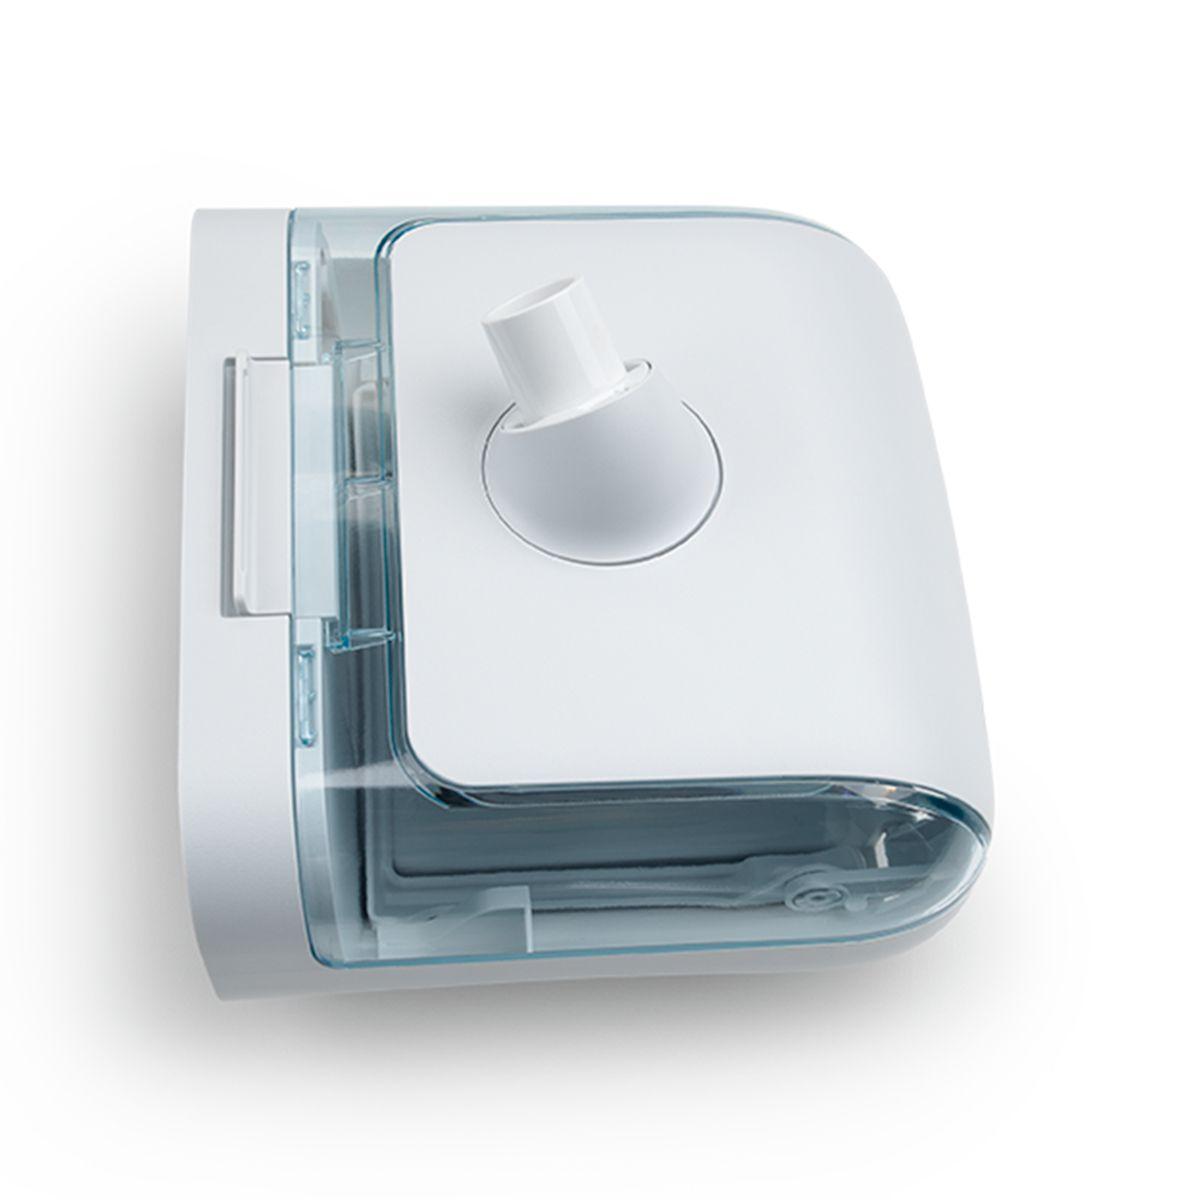 Umidificador DreamStation - Philips Respironics